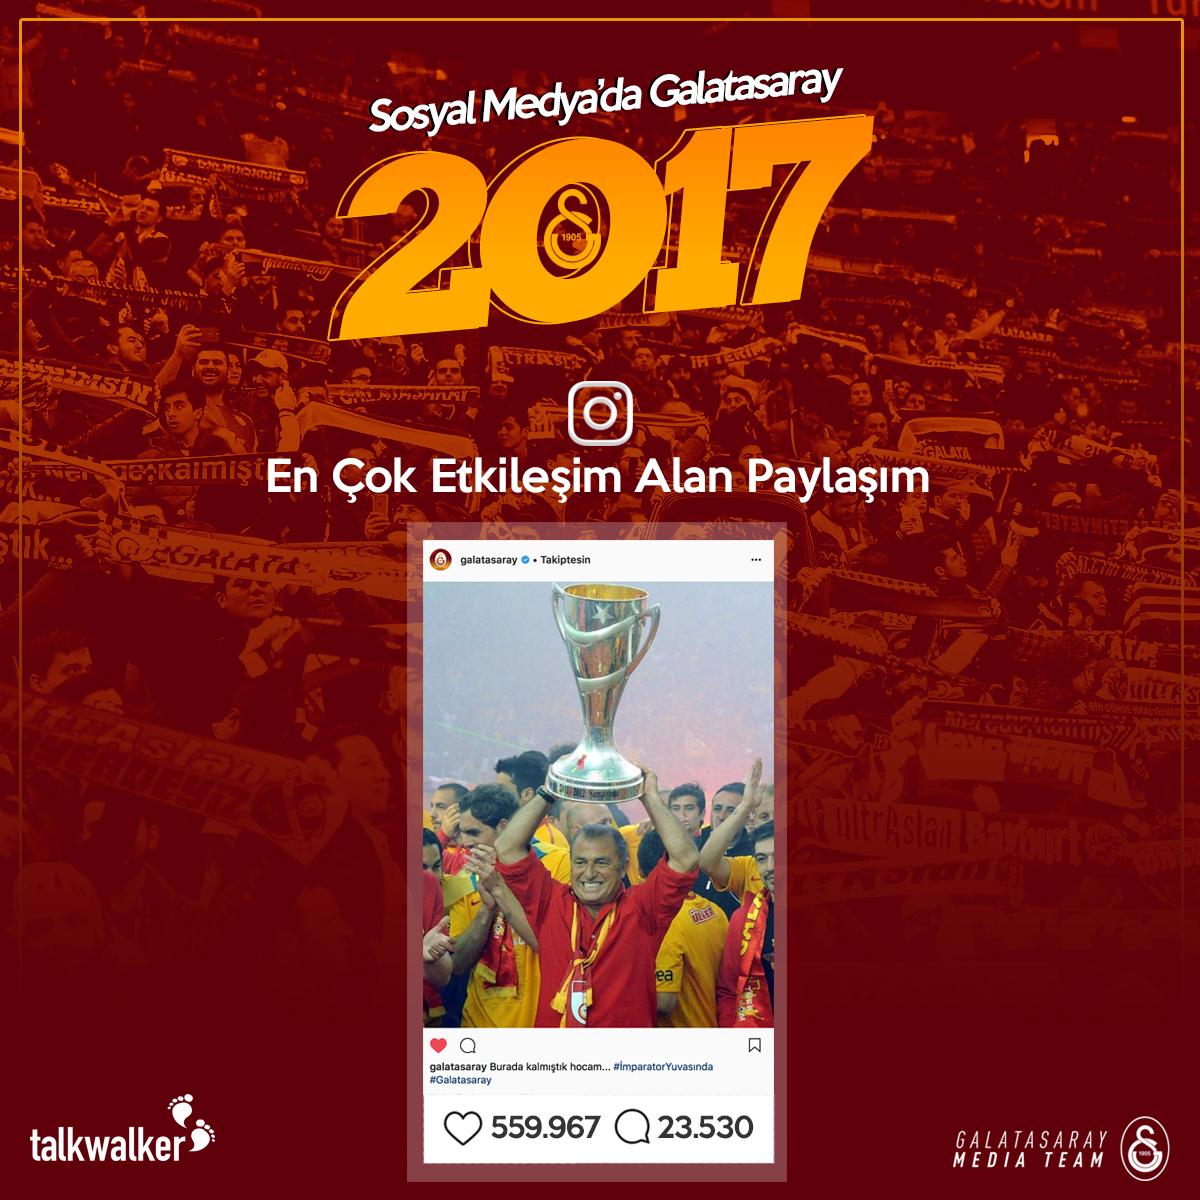 2017-sm-en-yuksek-instagram-etkilesim.jpg